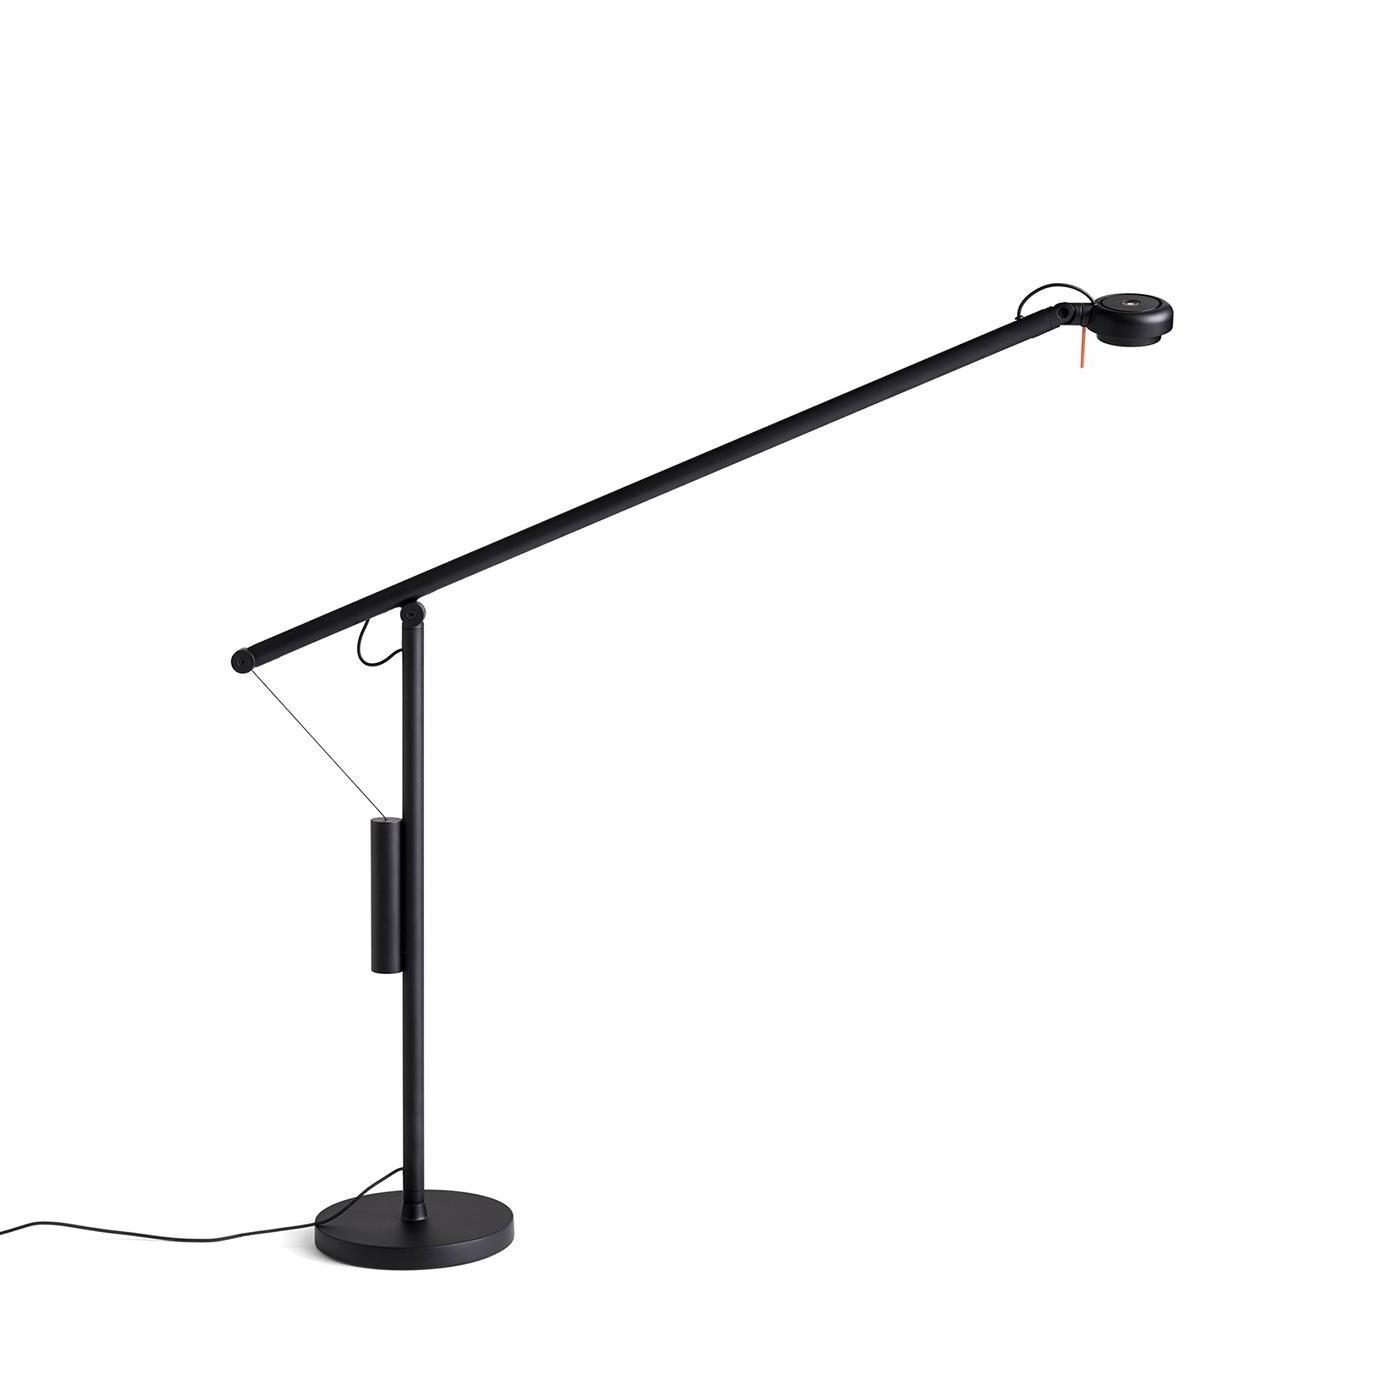 Ausbalancierte LED-Tischleuchte Fifty-Fifty